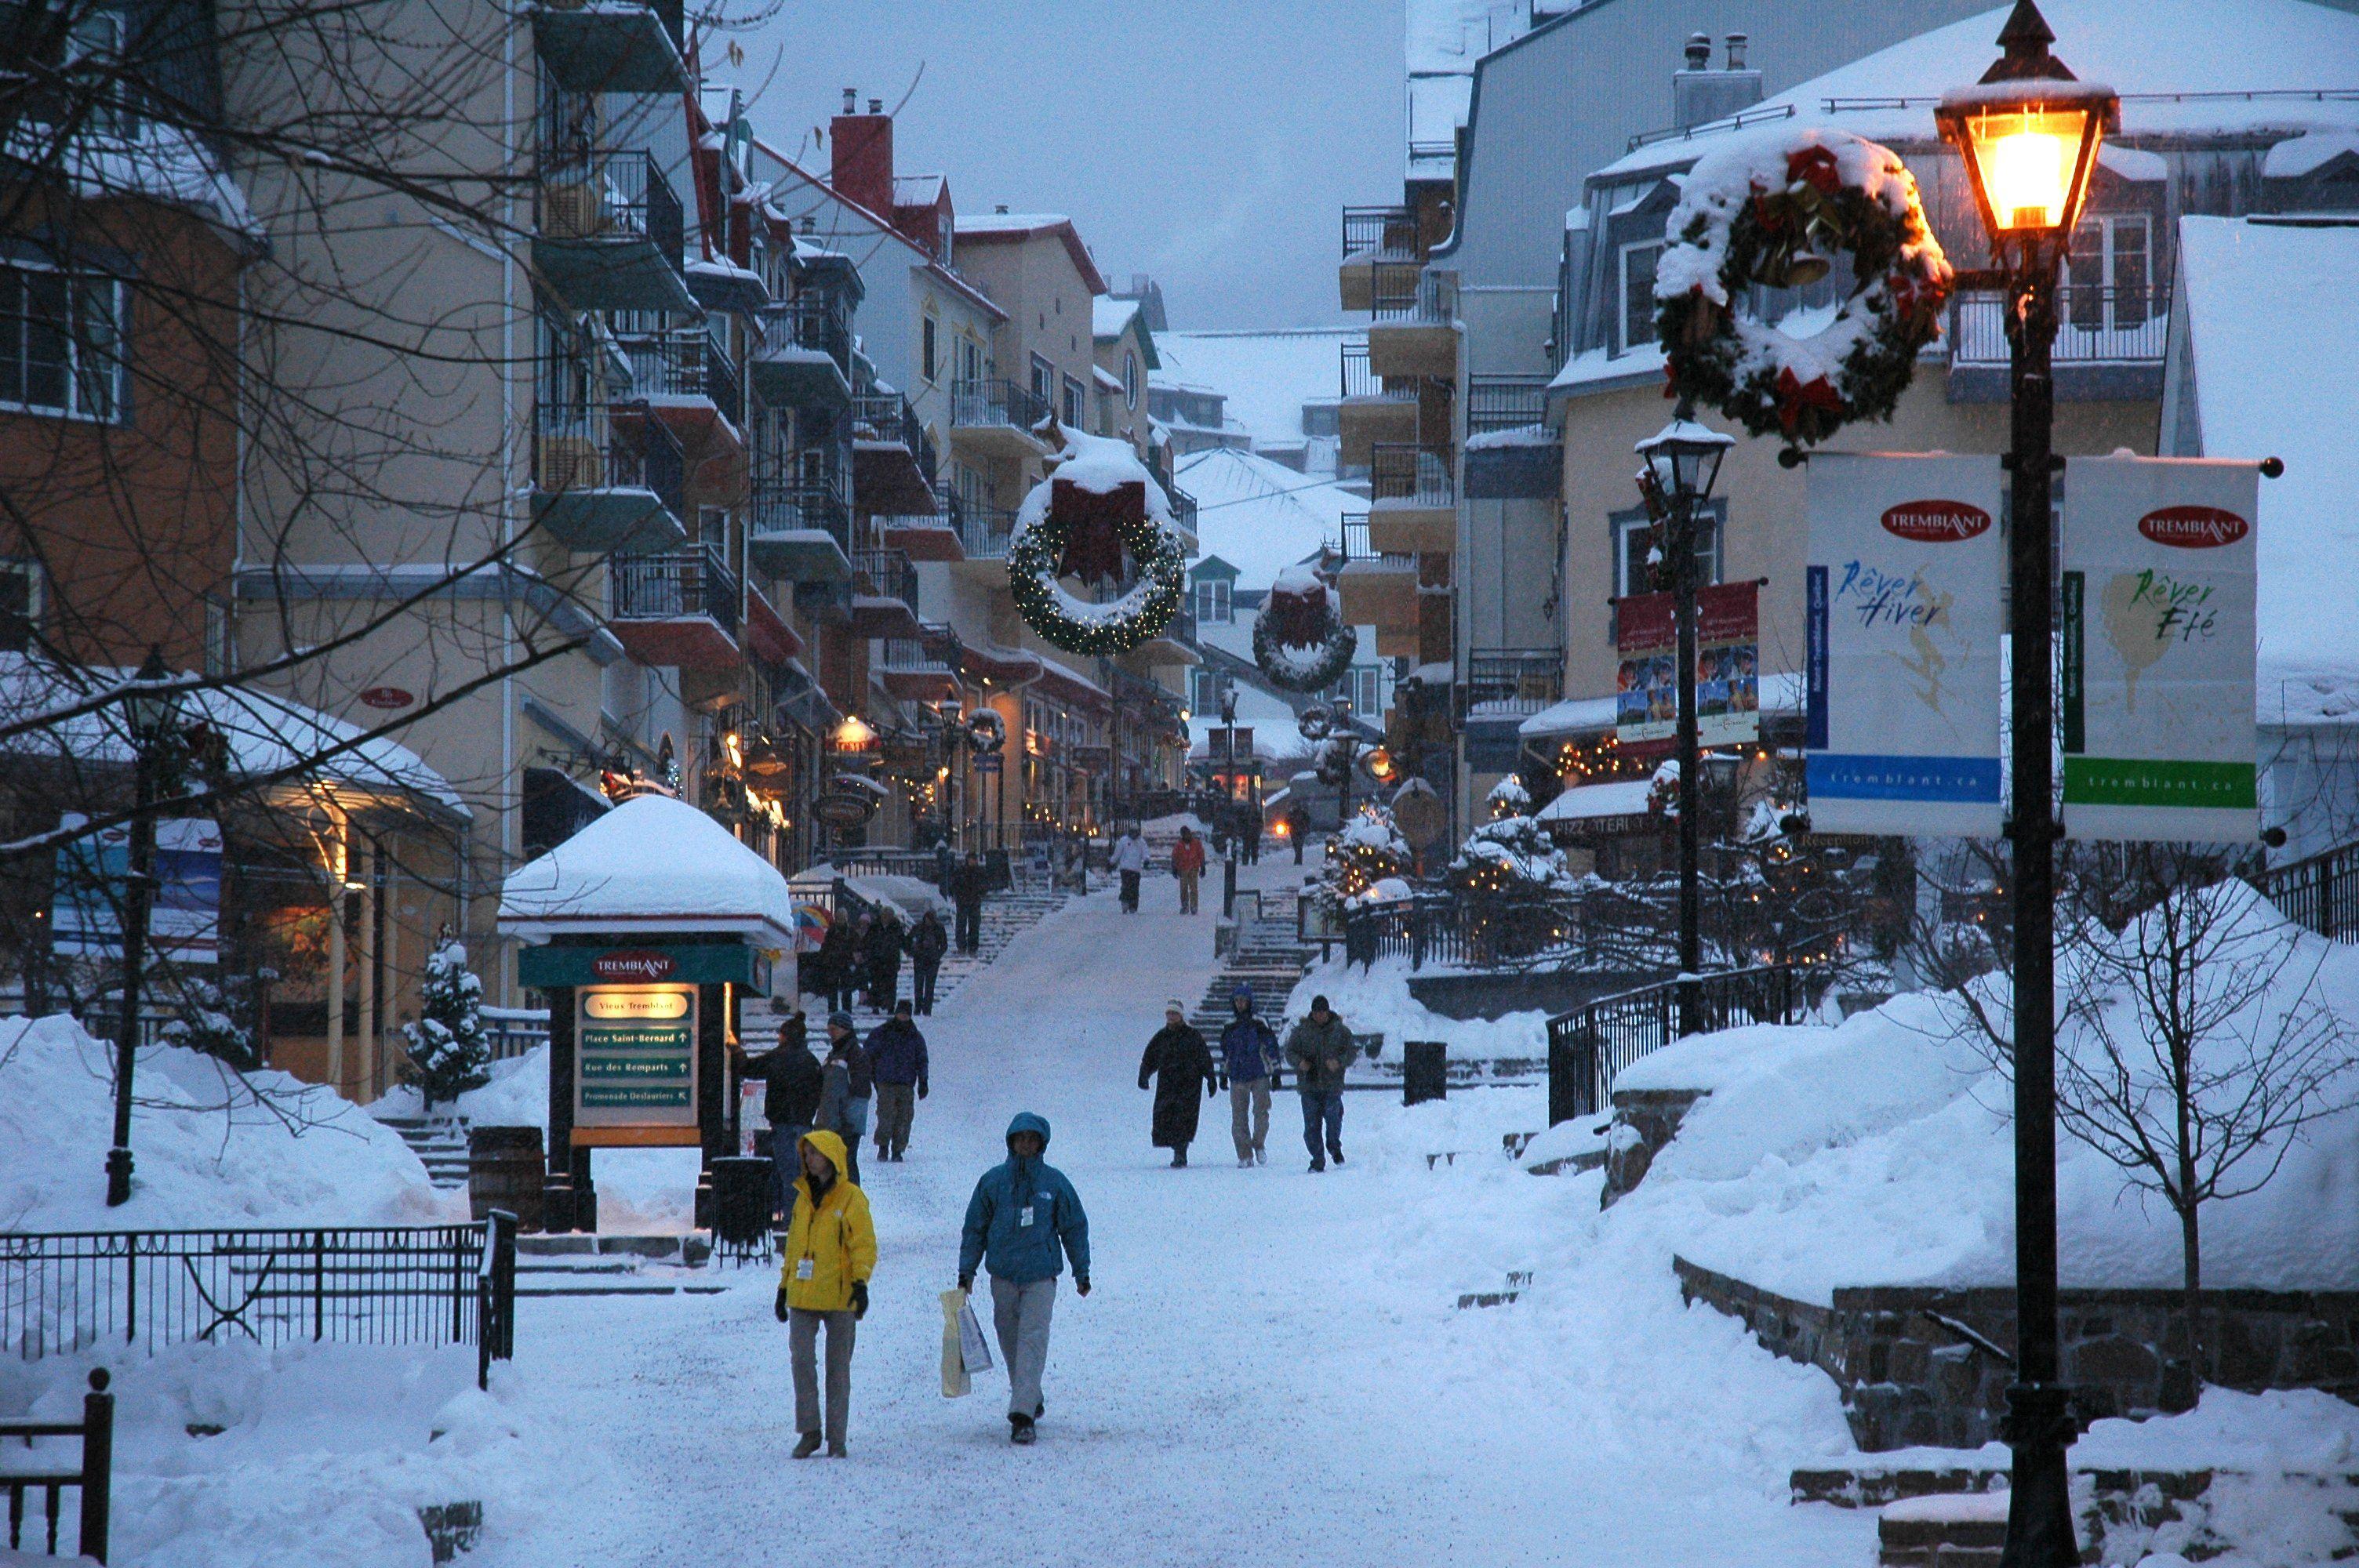 MONT TREMBLANT apres-ski guide